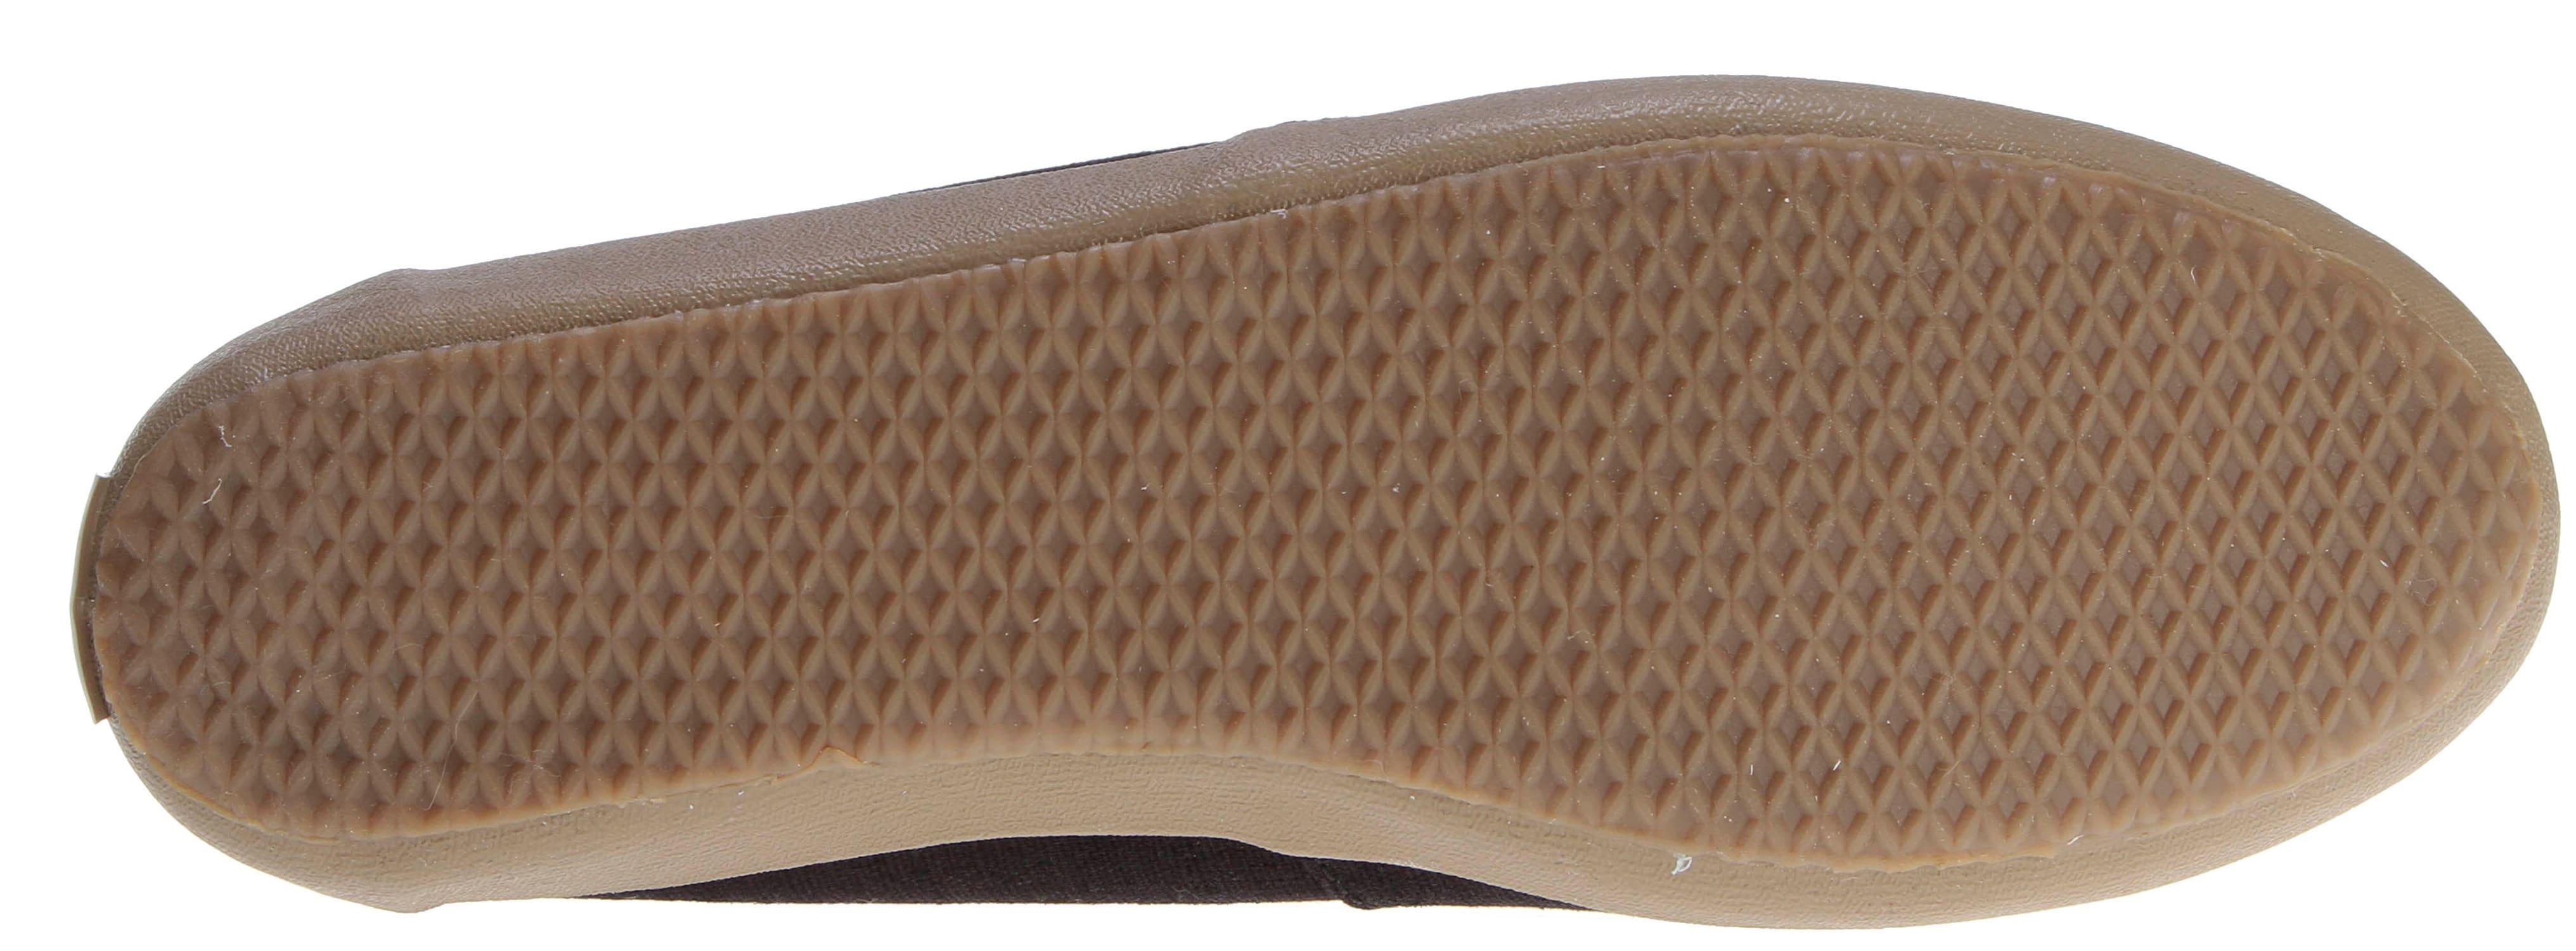 882994cd90 Vans Bixie Shoes - thumbnail 4